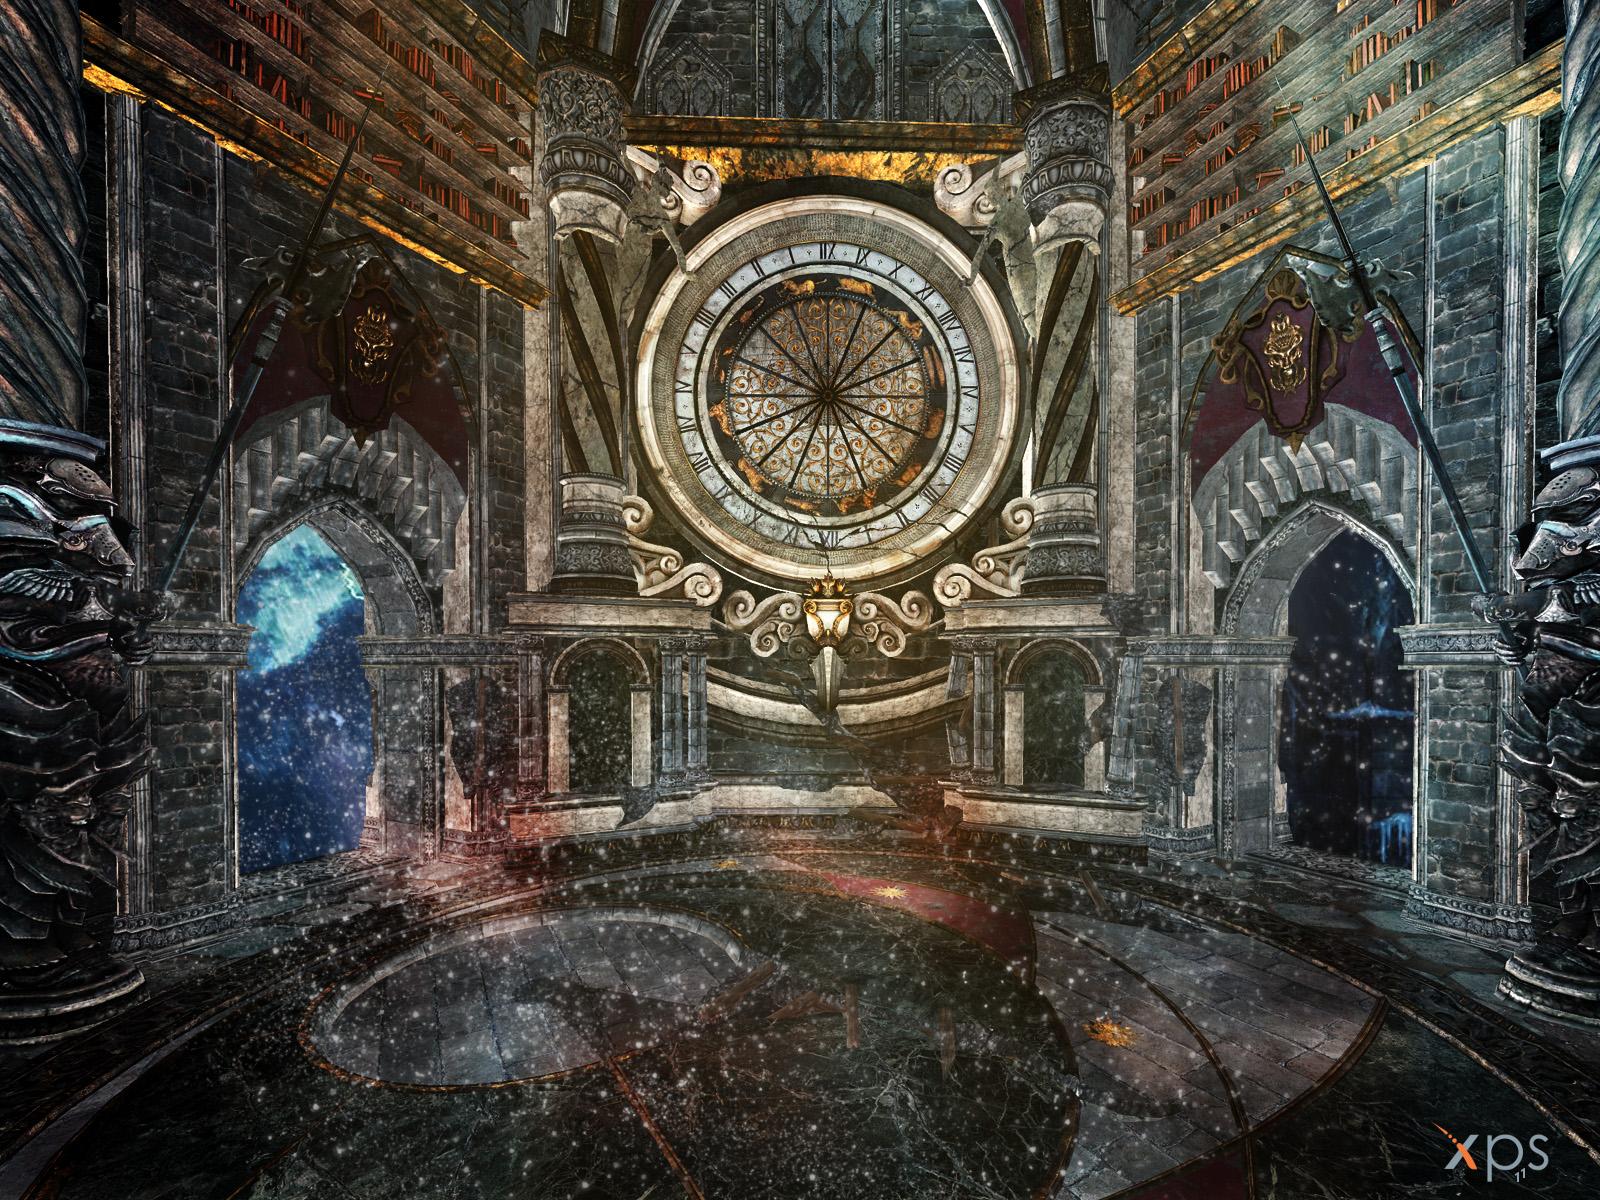 Towermech Clock by PaleVirus